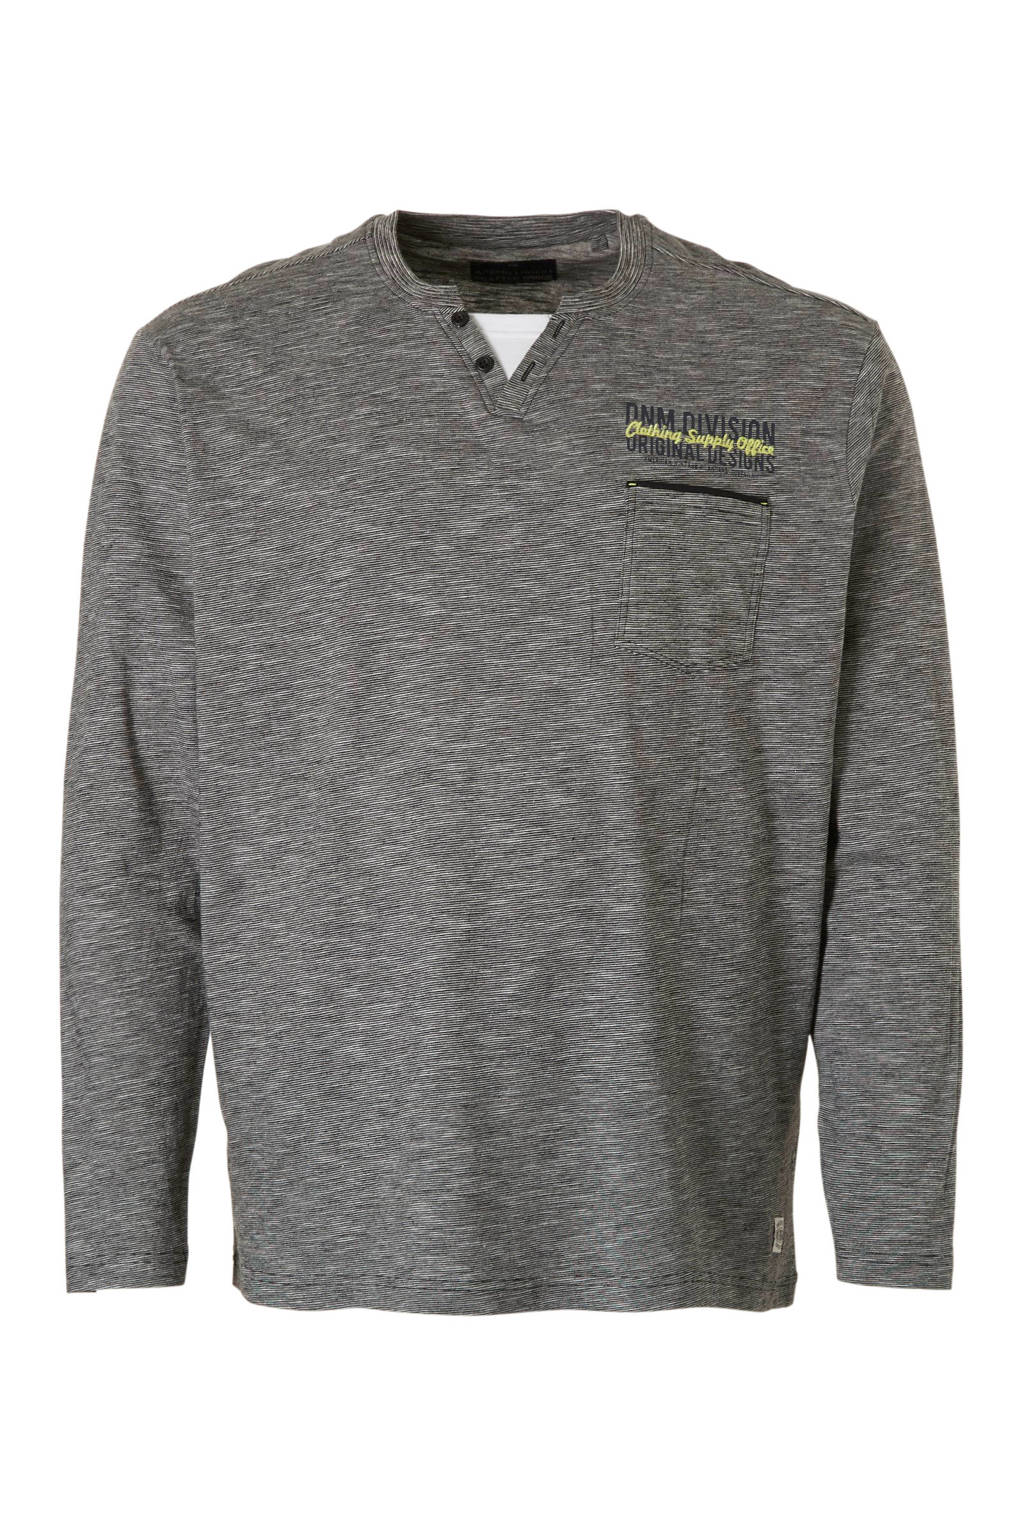 C&A XL Angelo Litrico gestreept T-shirt grijs, Grijs/wit